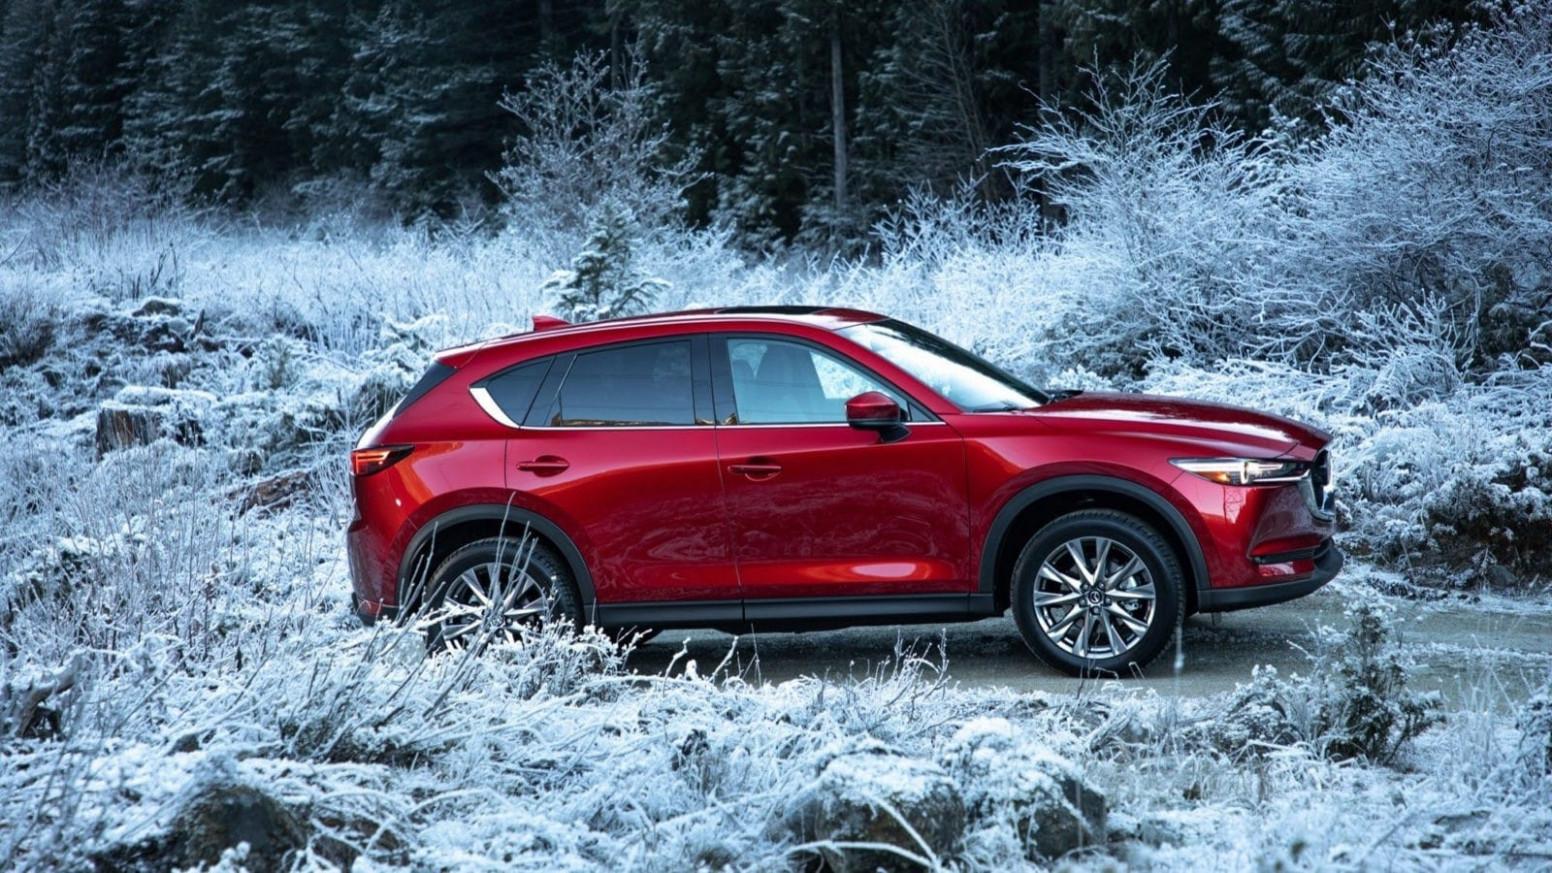 Concept Mazda Cx 3 Hybrid 2022